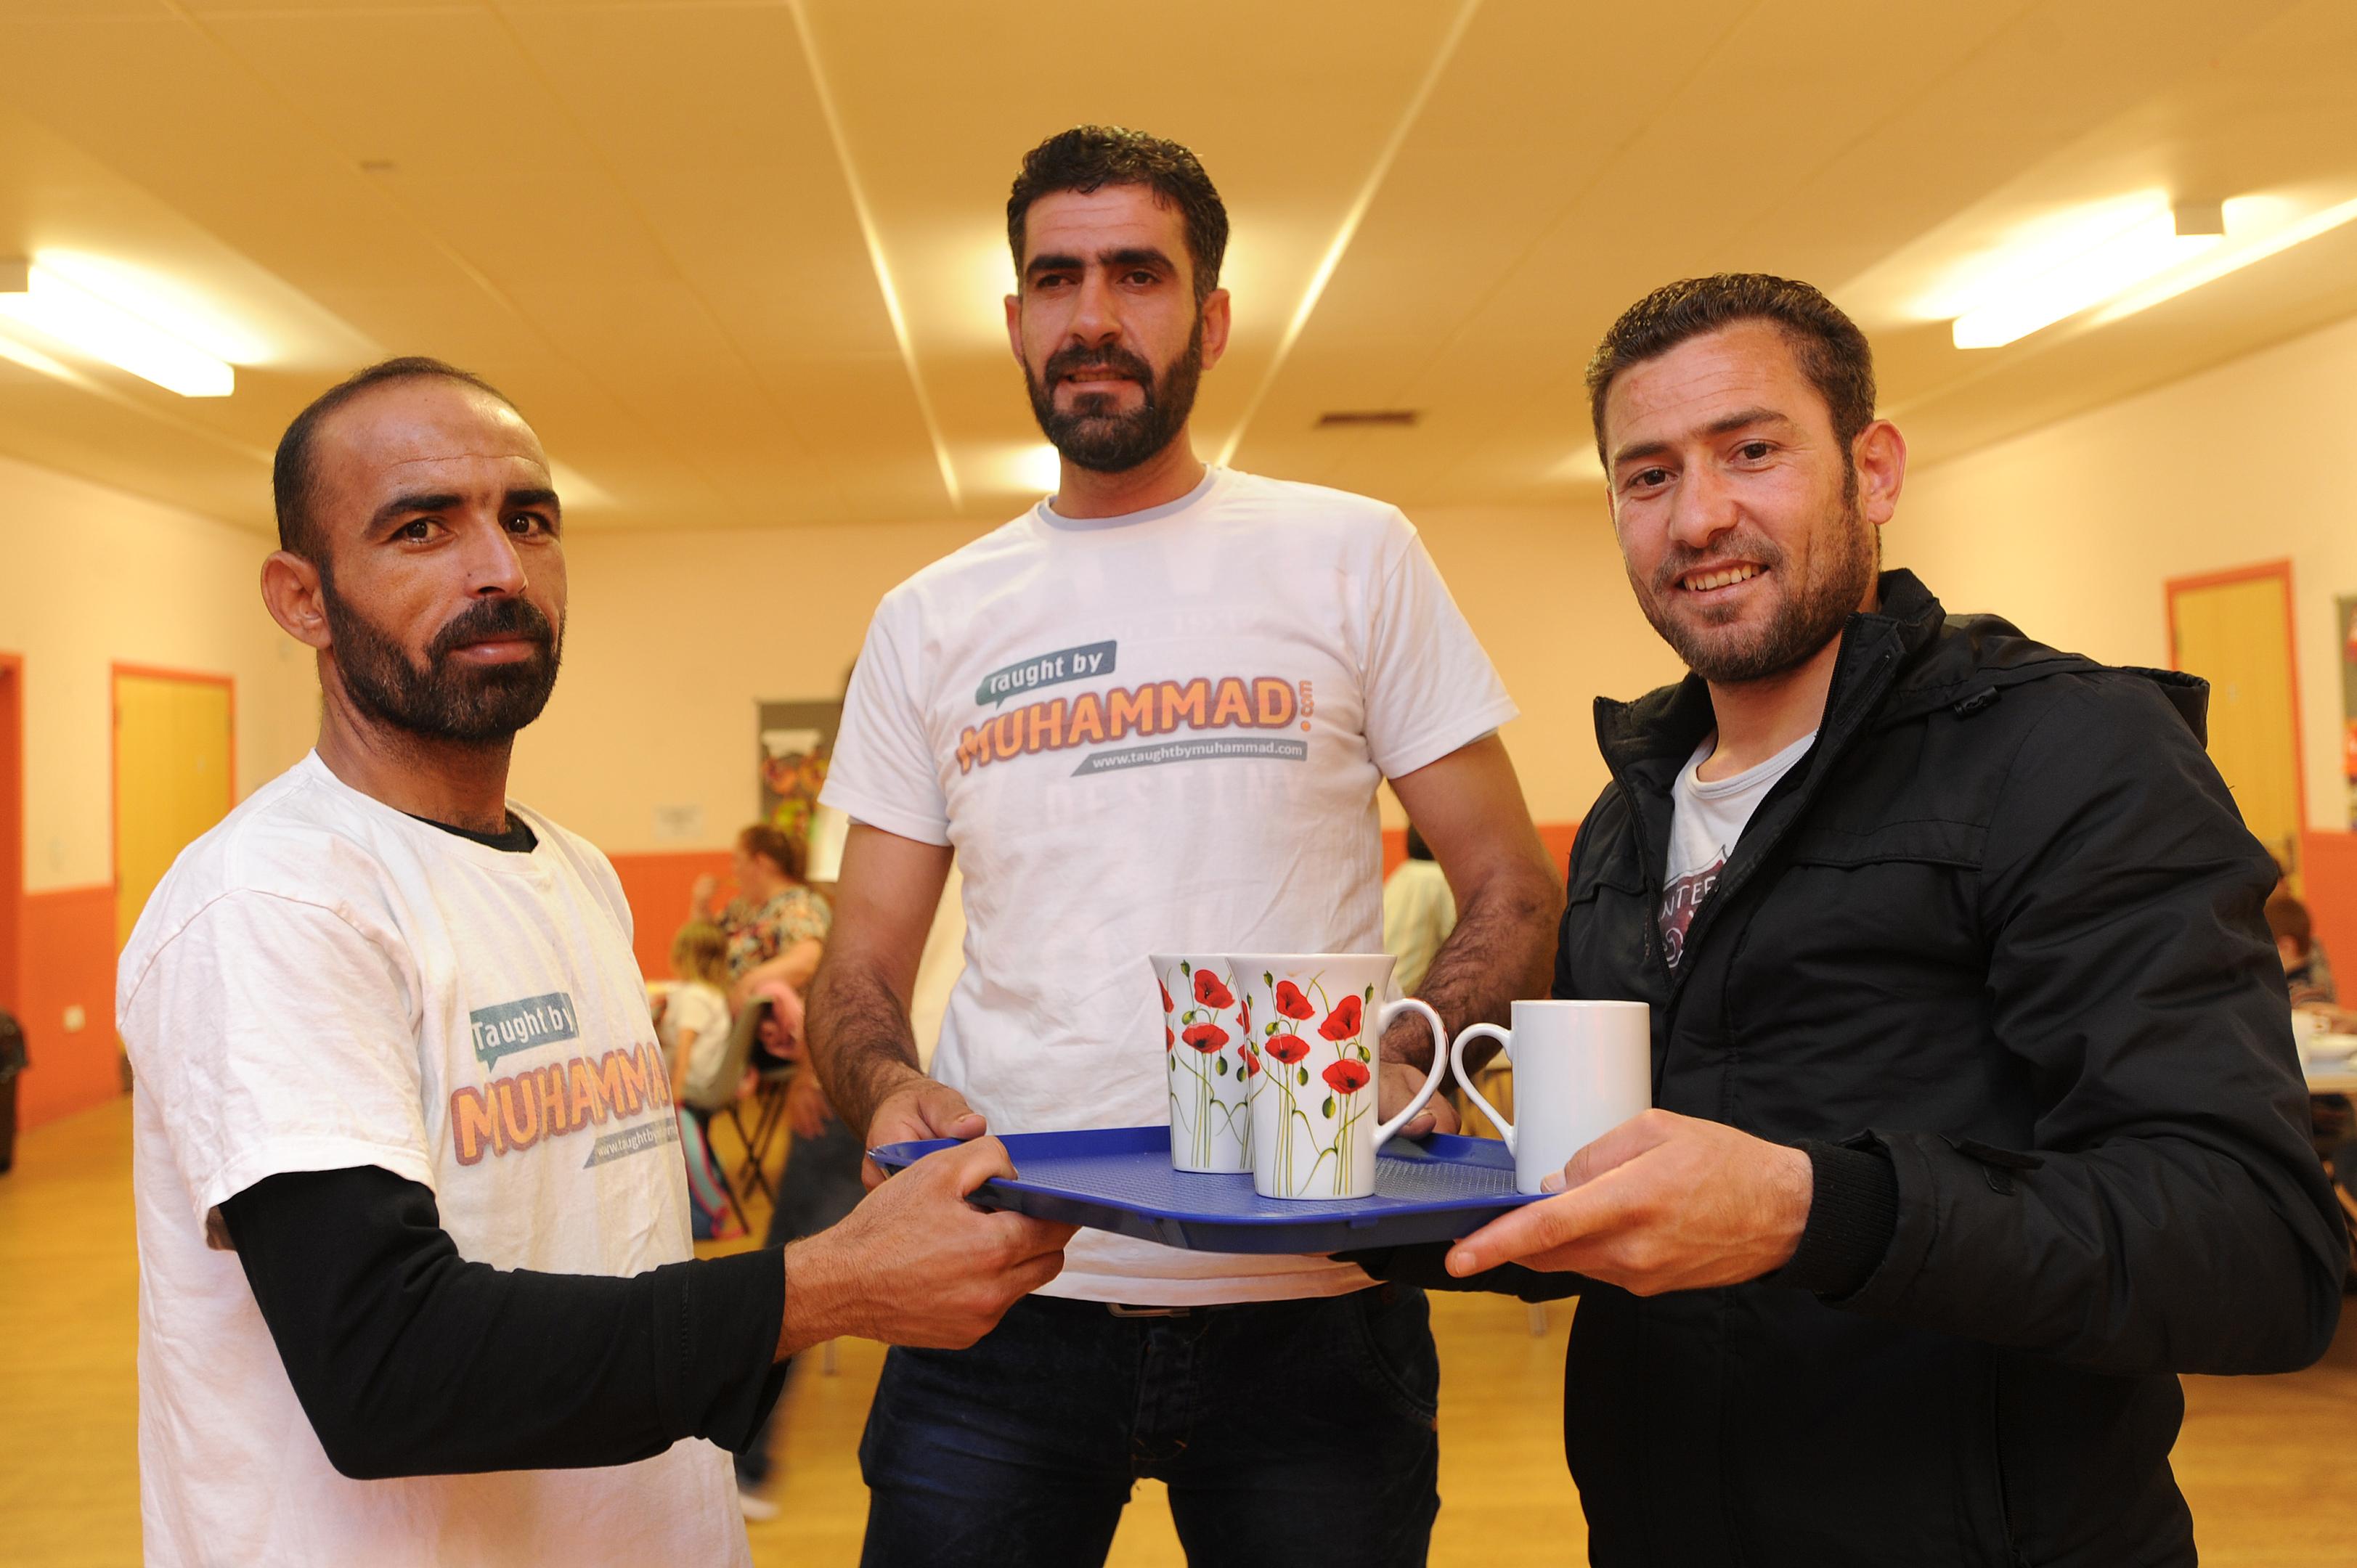 L-R: Imaad Zakariya, Tayseer Al-Balkhi and Thamer Humsi at Charleston Community Centre.